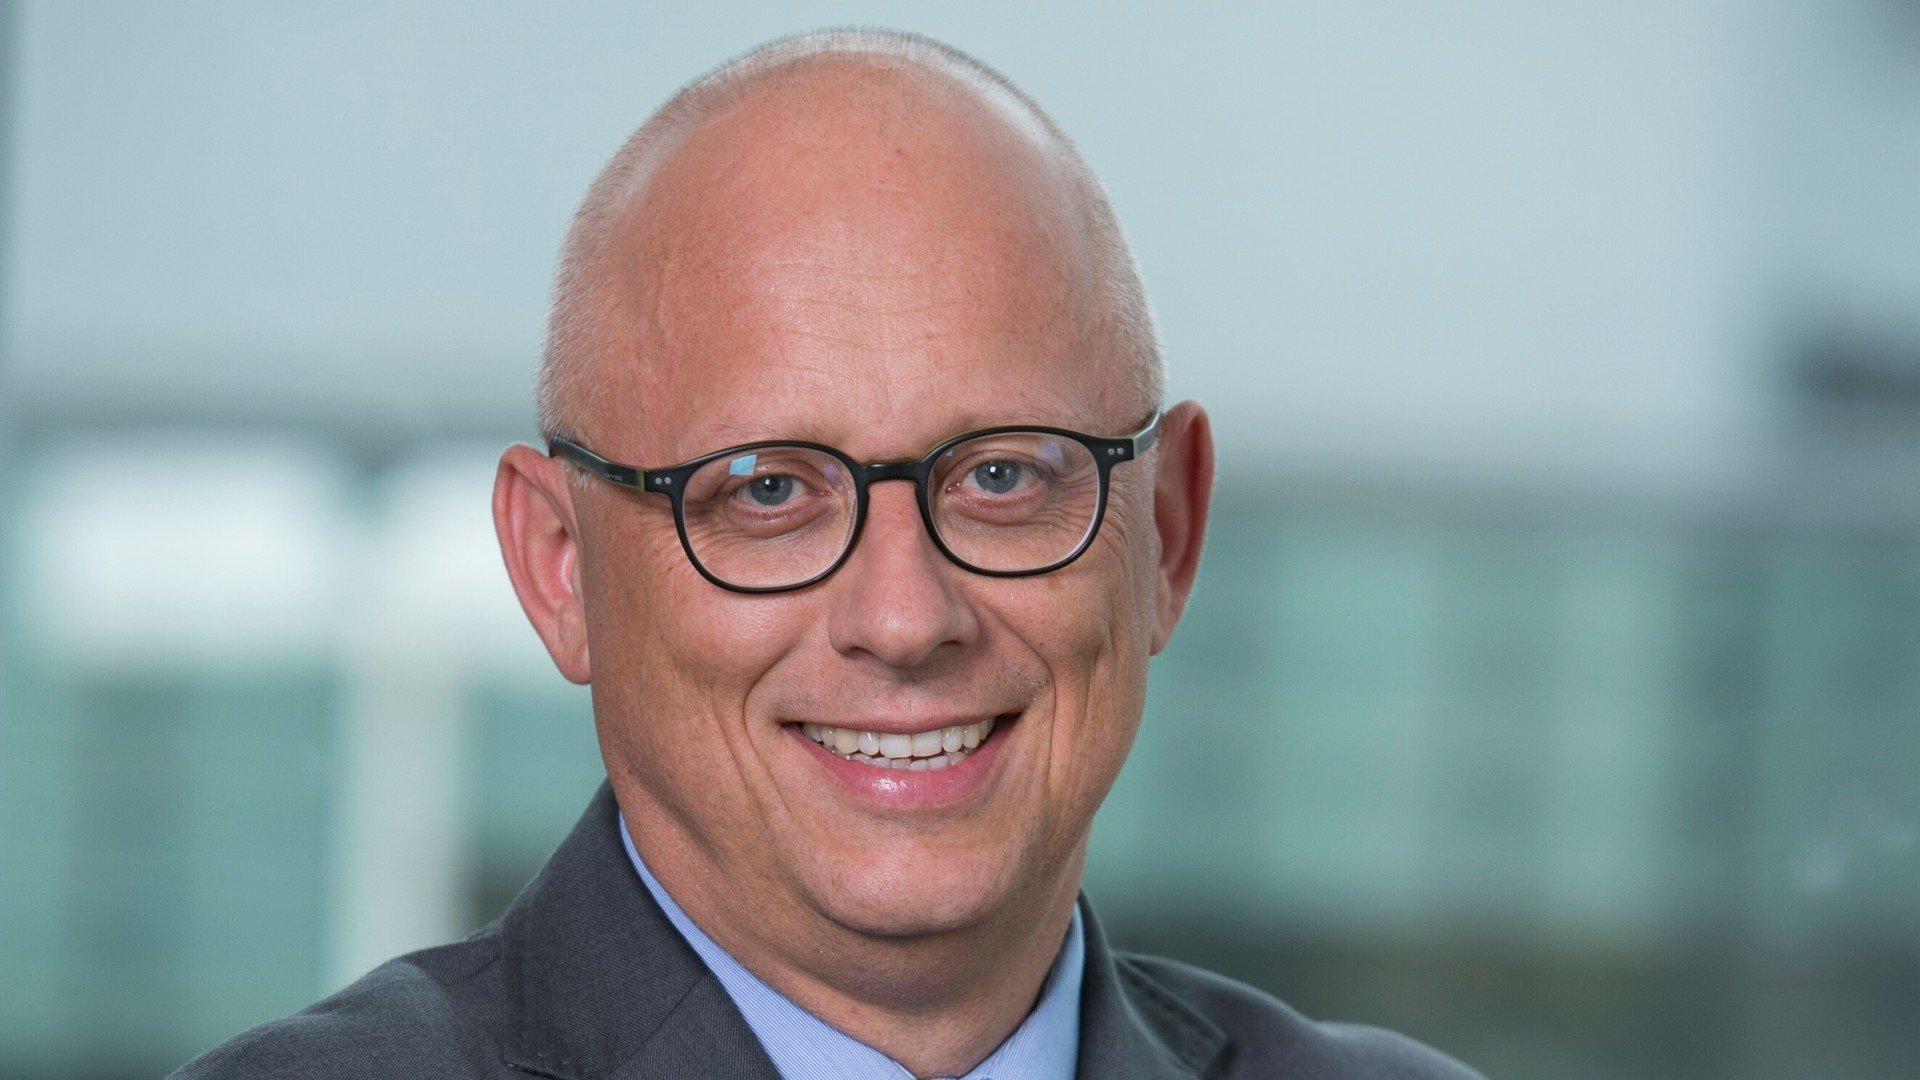 Senior Oracle Executive Joins Synerise